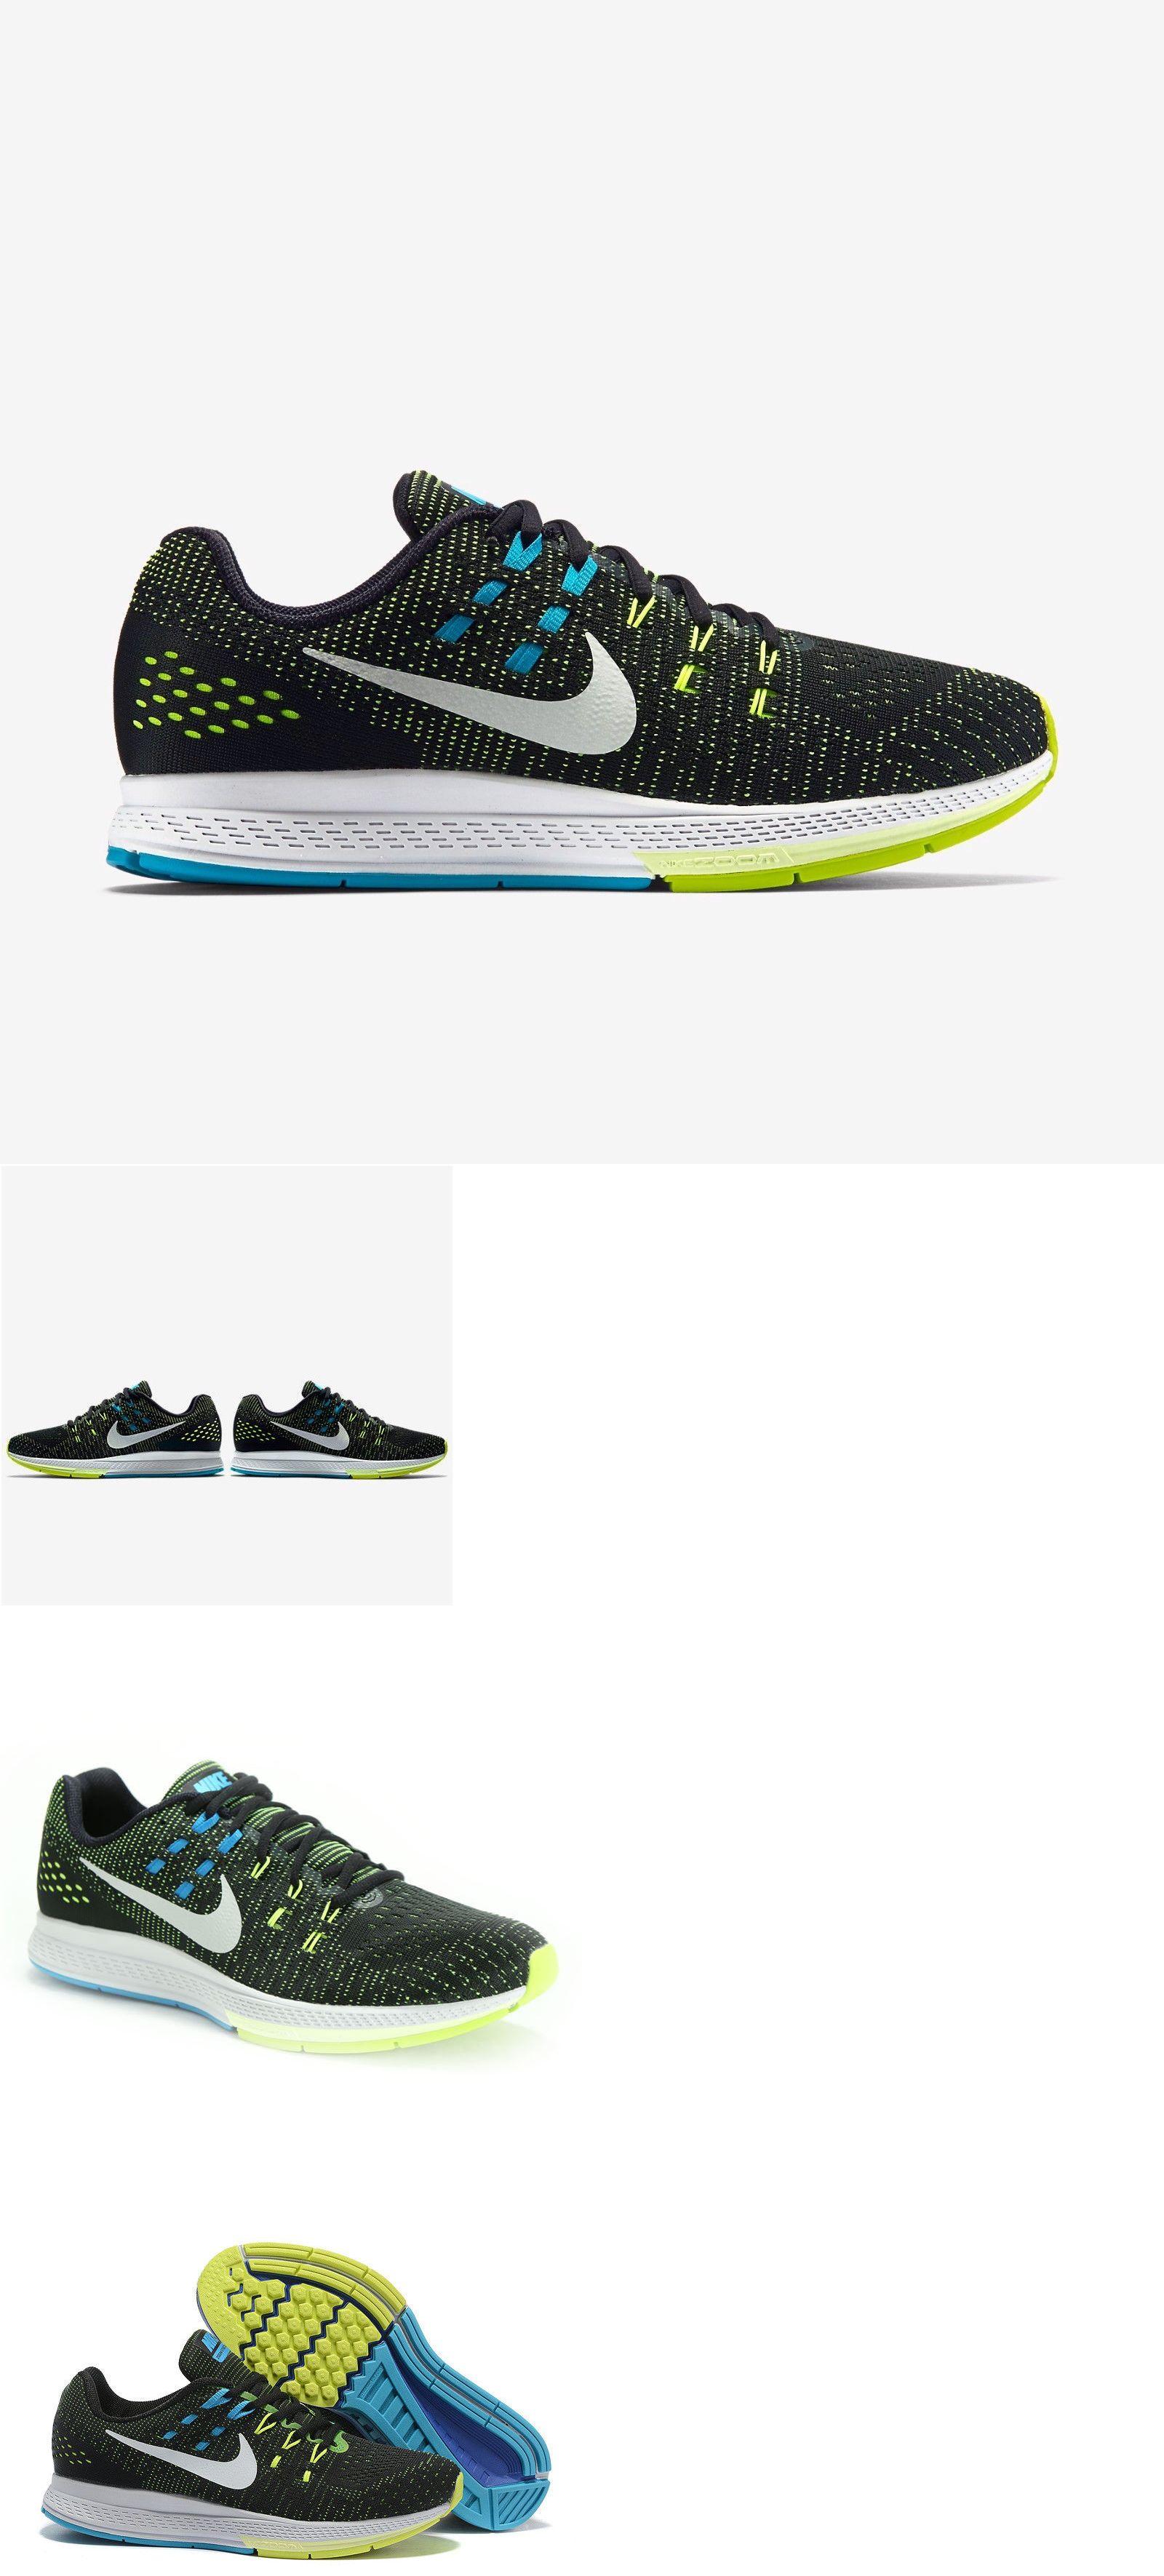 Men 158952: Nike Men S Air Zoom Structure 19 - Black Platinum-Volt-